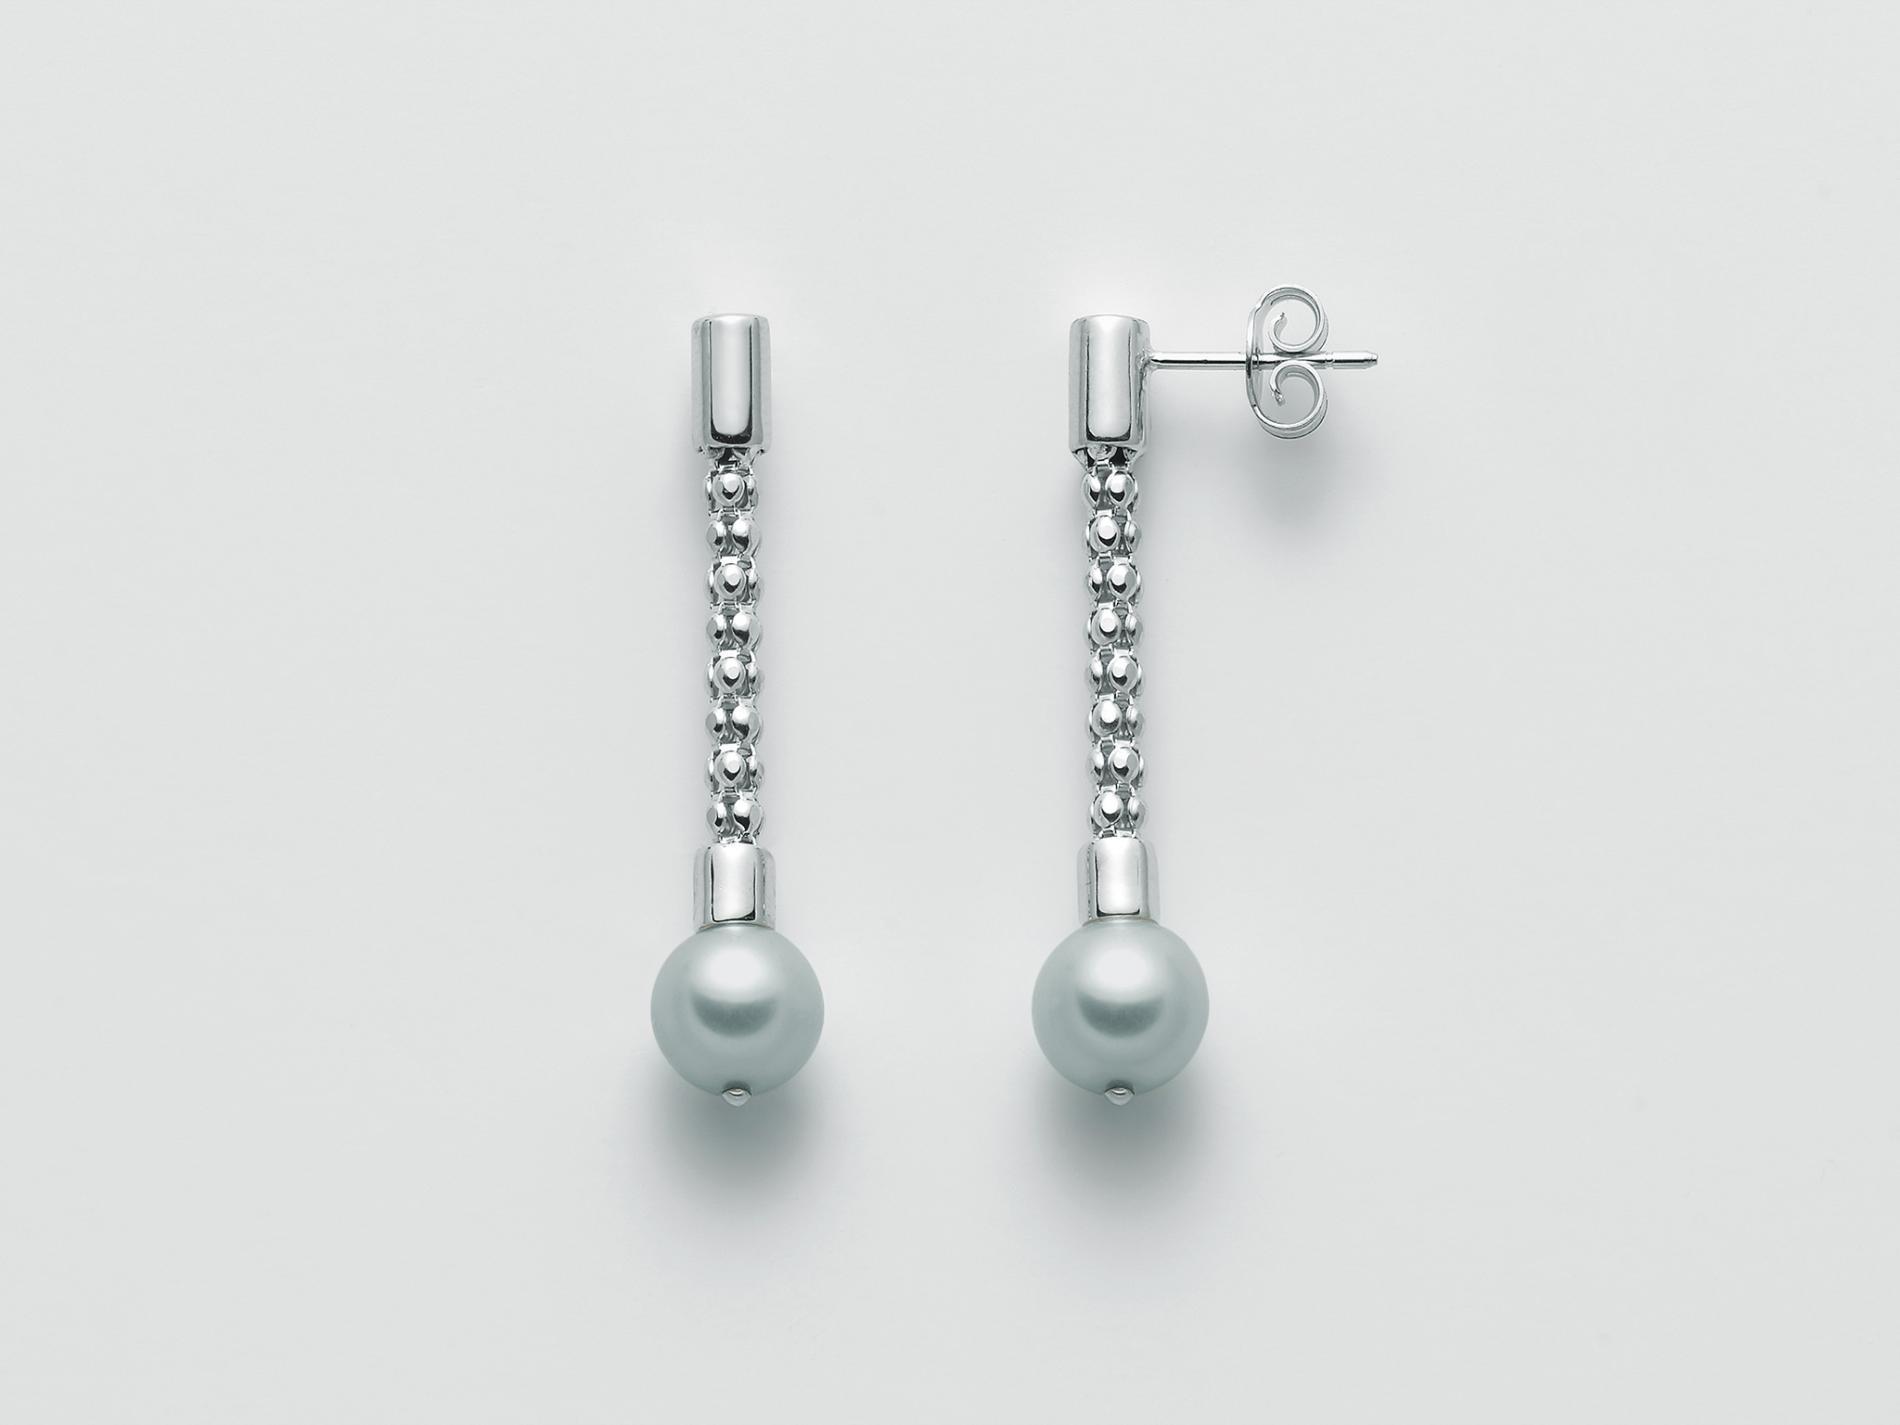 Orecchini pendenti argento Miluna PER2410